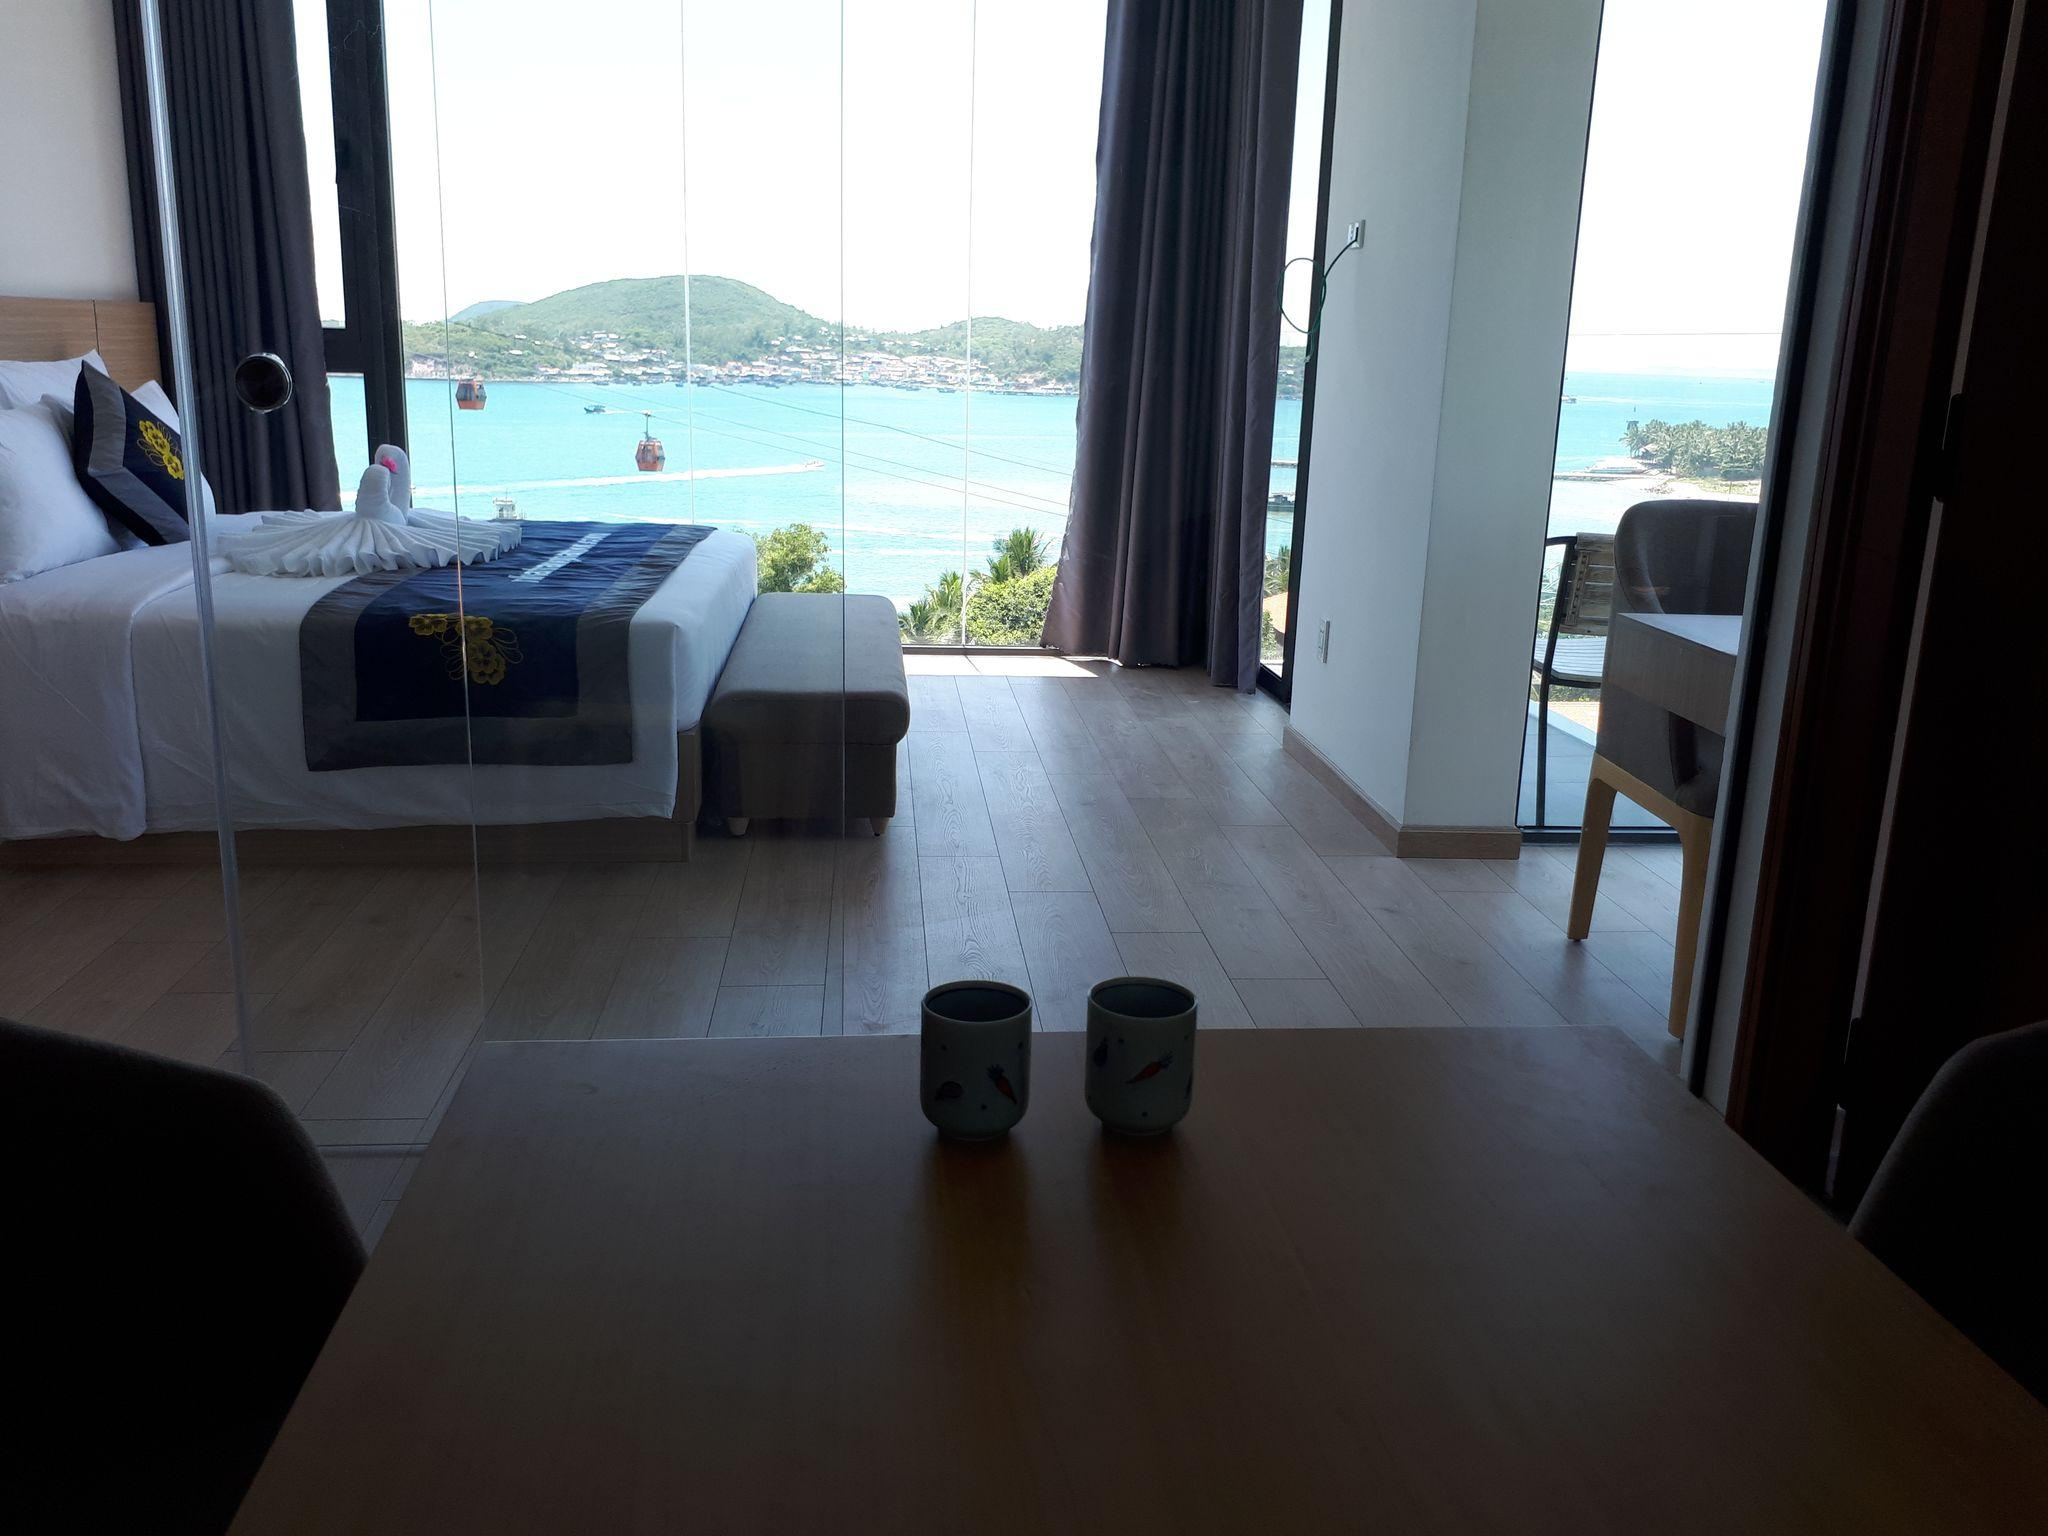 Nha Trang Harbor 2 Bedrooms Studio 3